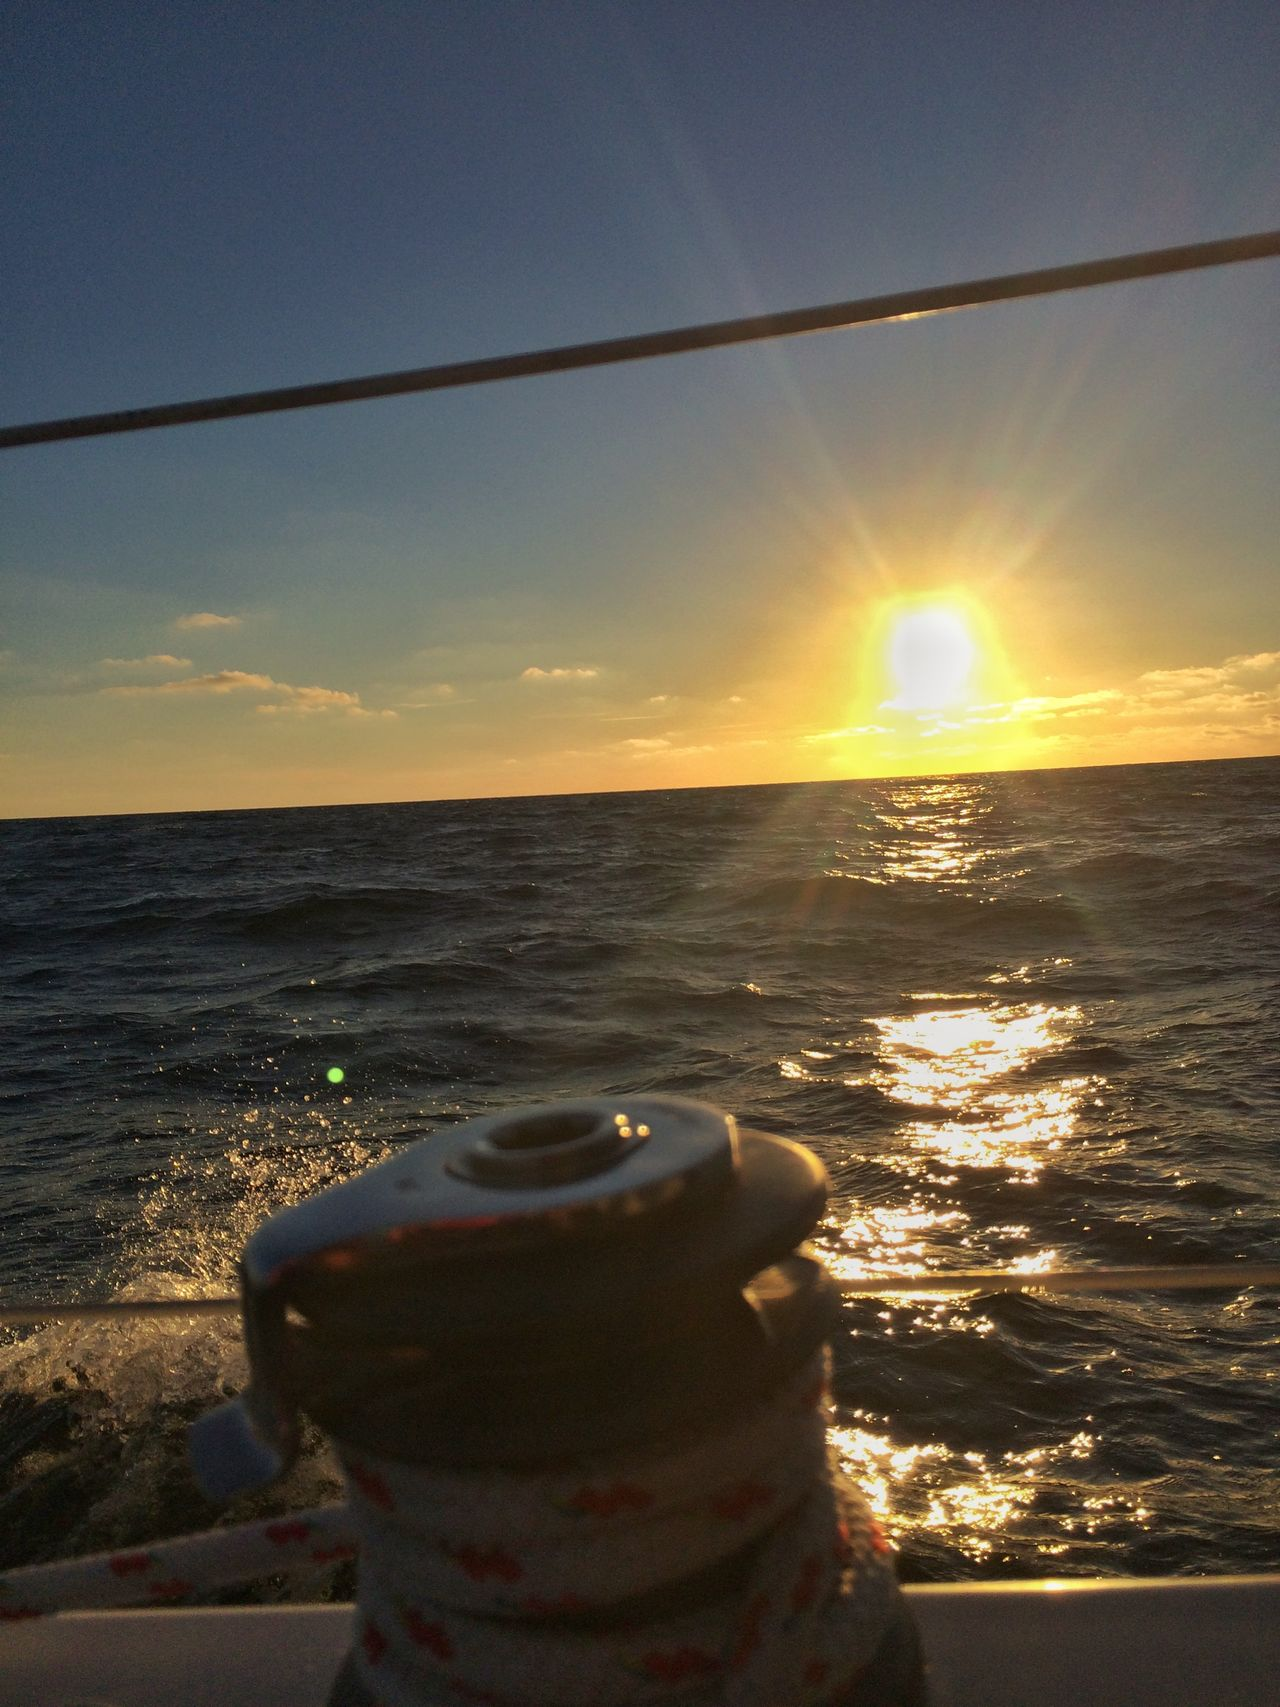 Going Sailing Sunset Baltic Sea on The way to Klaipeda PolLitLett2015